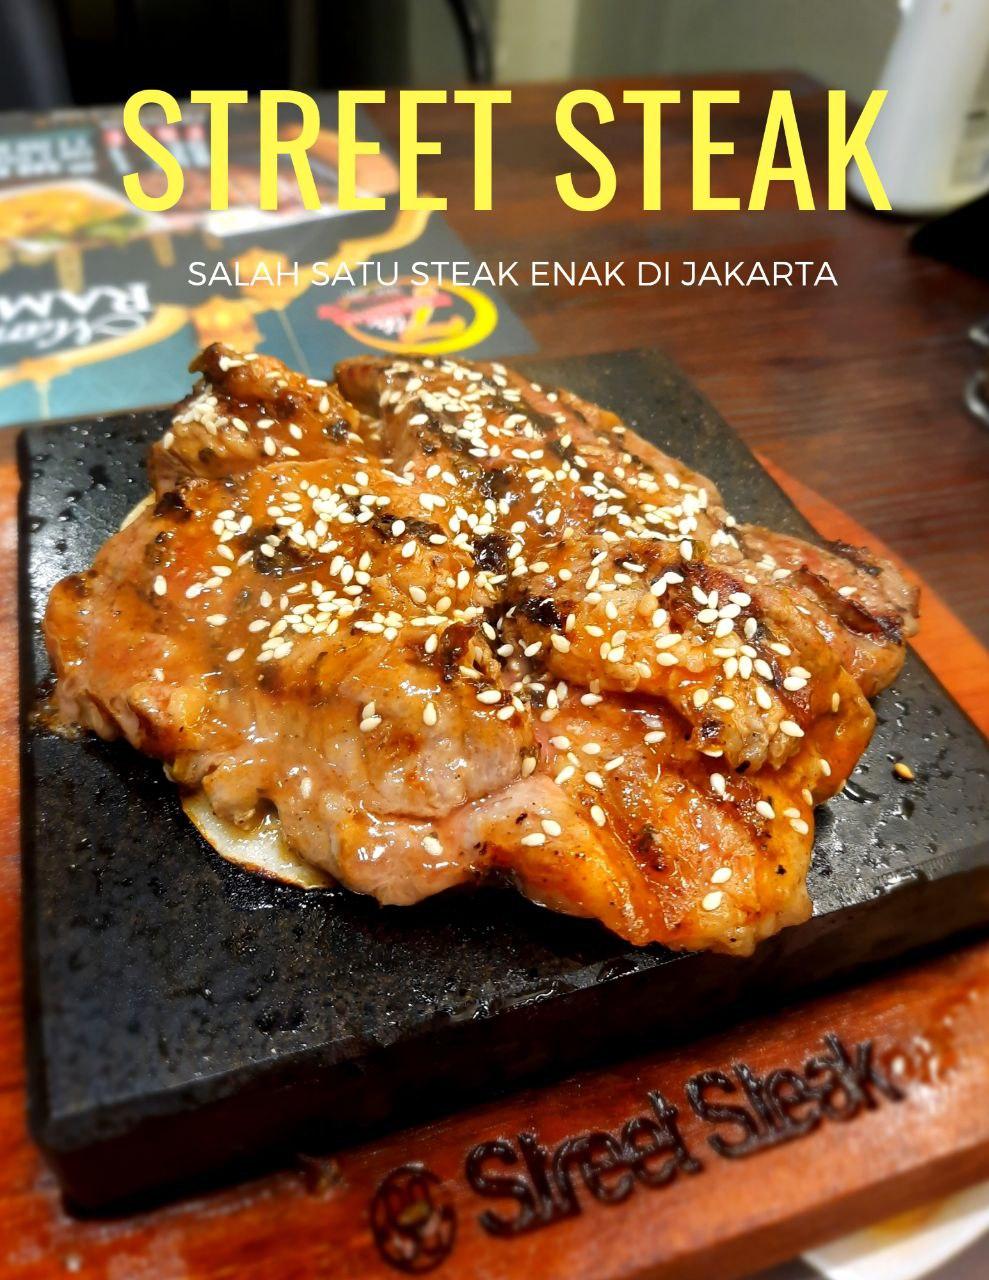 Steak Enak di Jakarta, Street Steak Restoran.